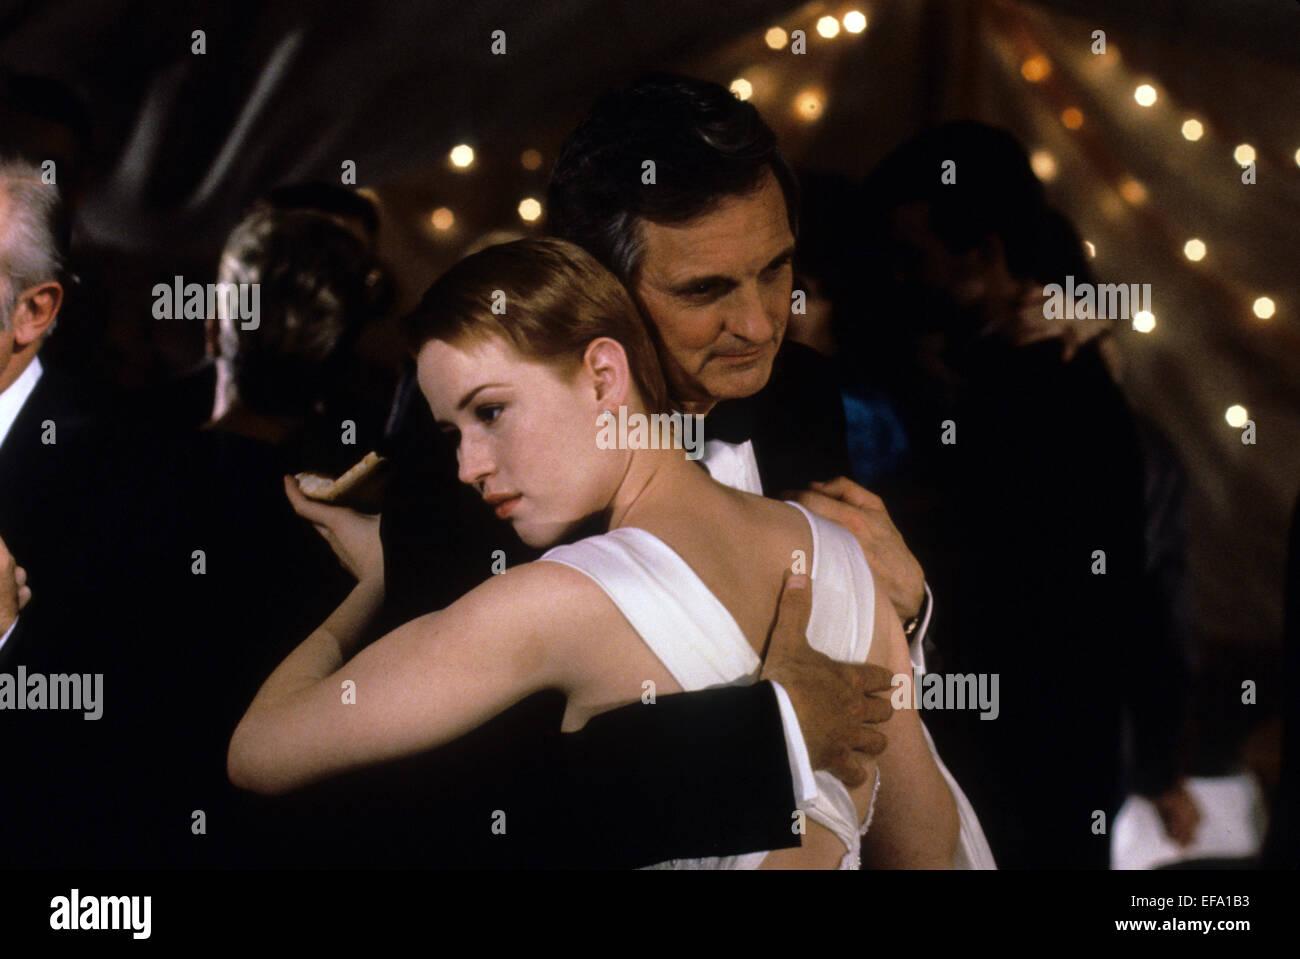 Molly Ringwald Alan Alda Betsy S Wedding 1990 Stock Photo